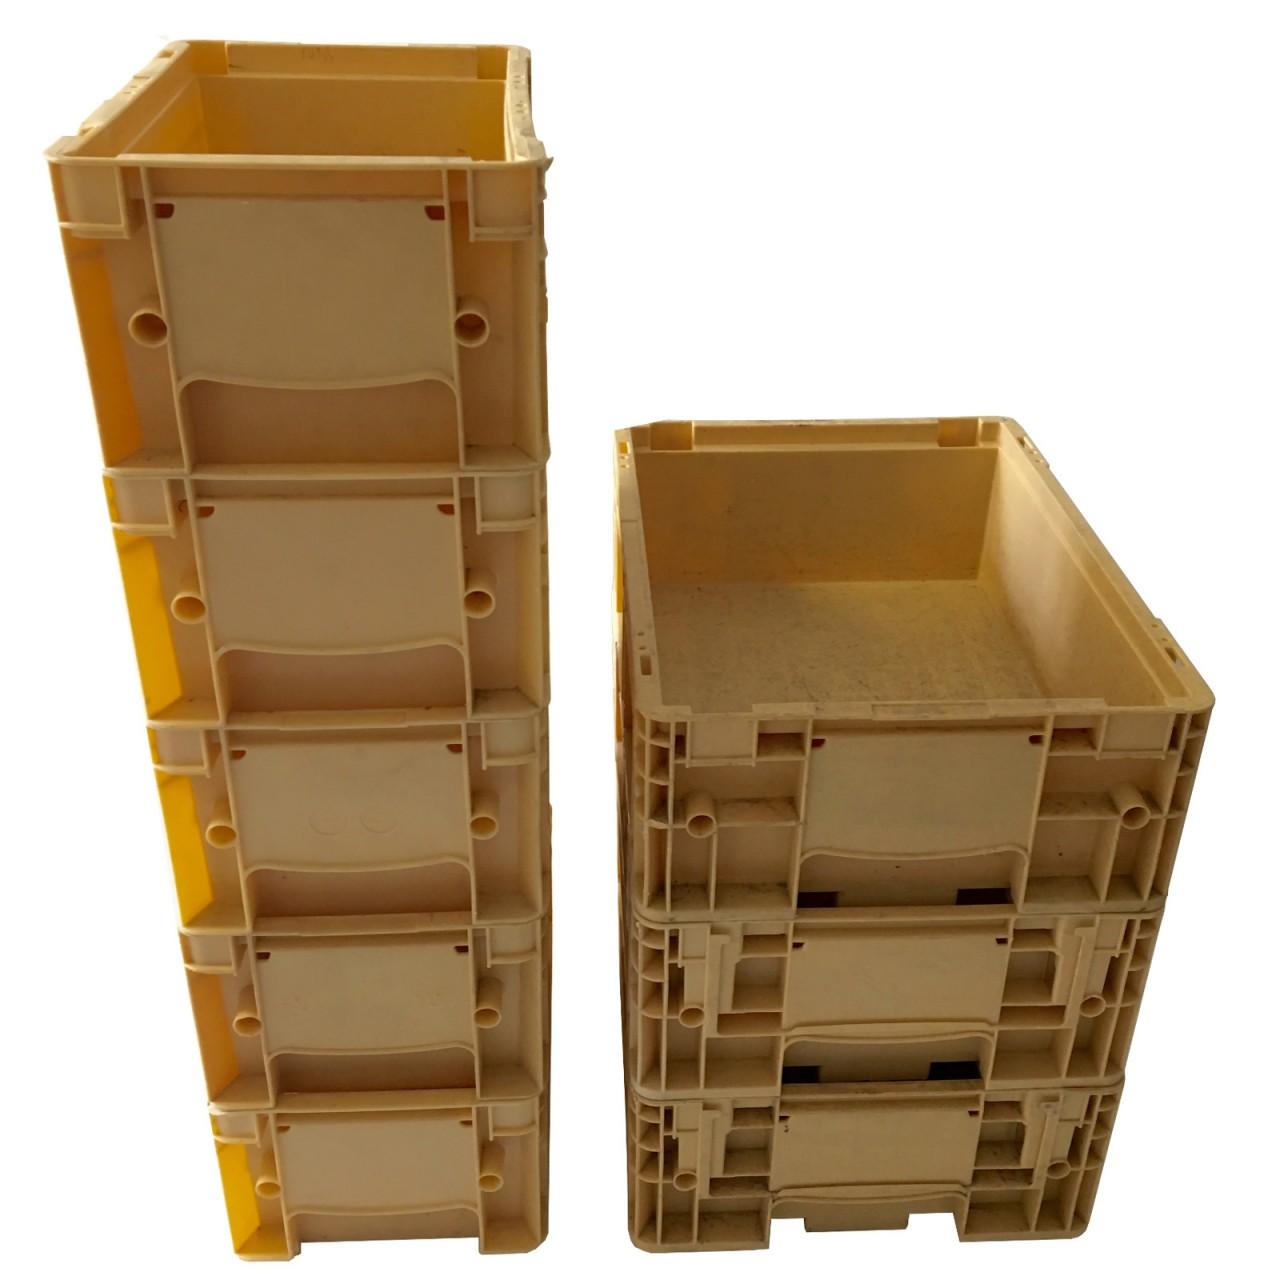 KLT Kleinladungsträger stapelbar KLT Behälter 3215